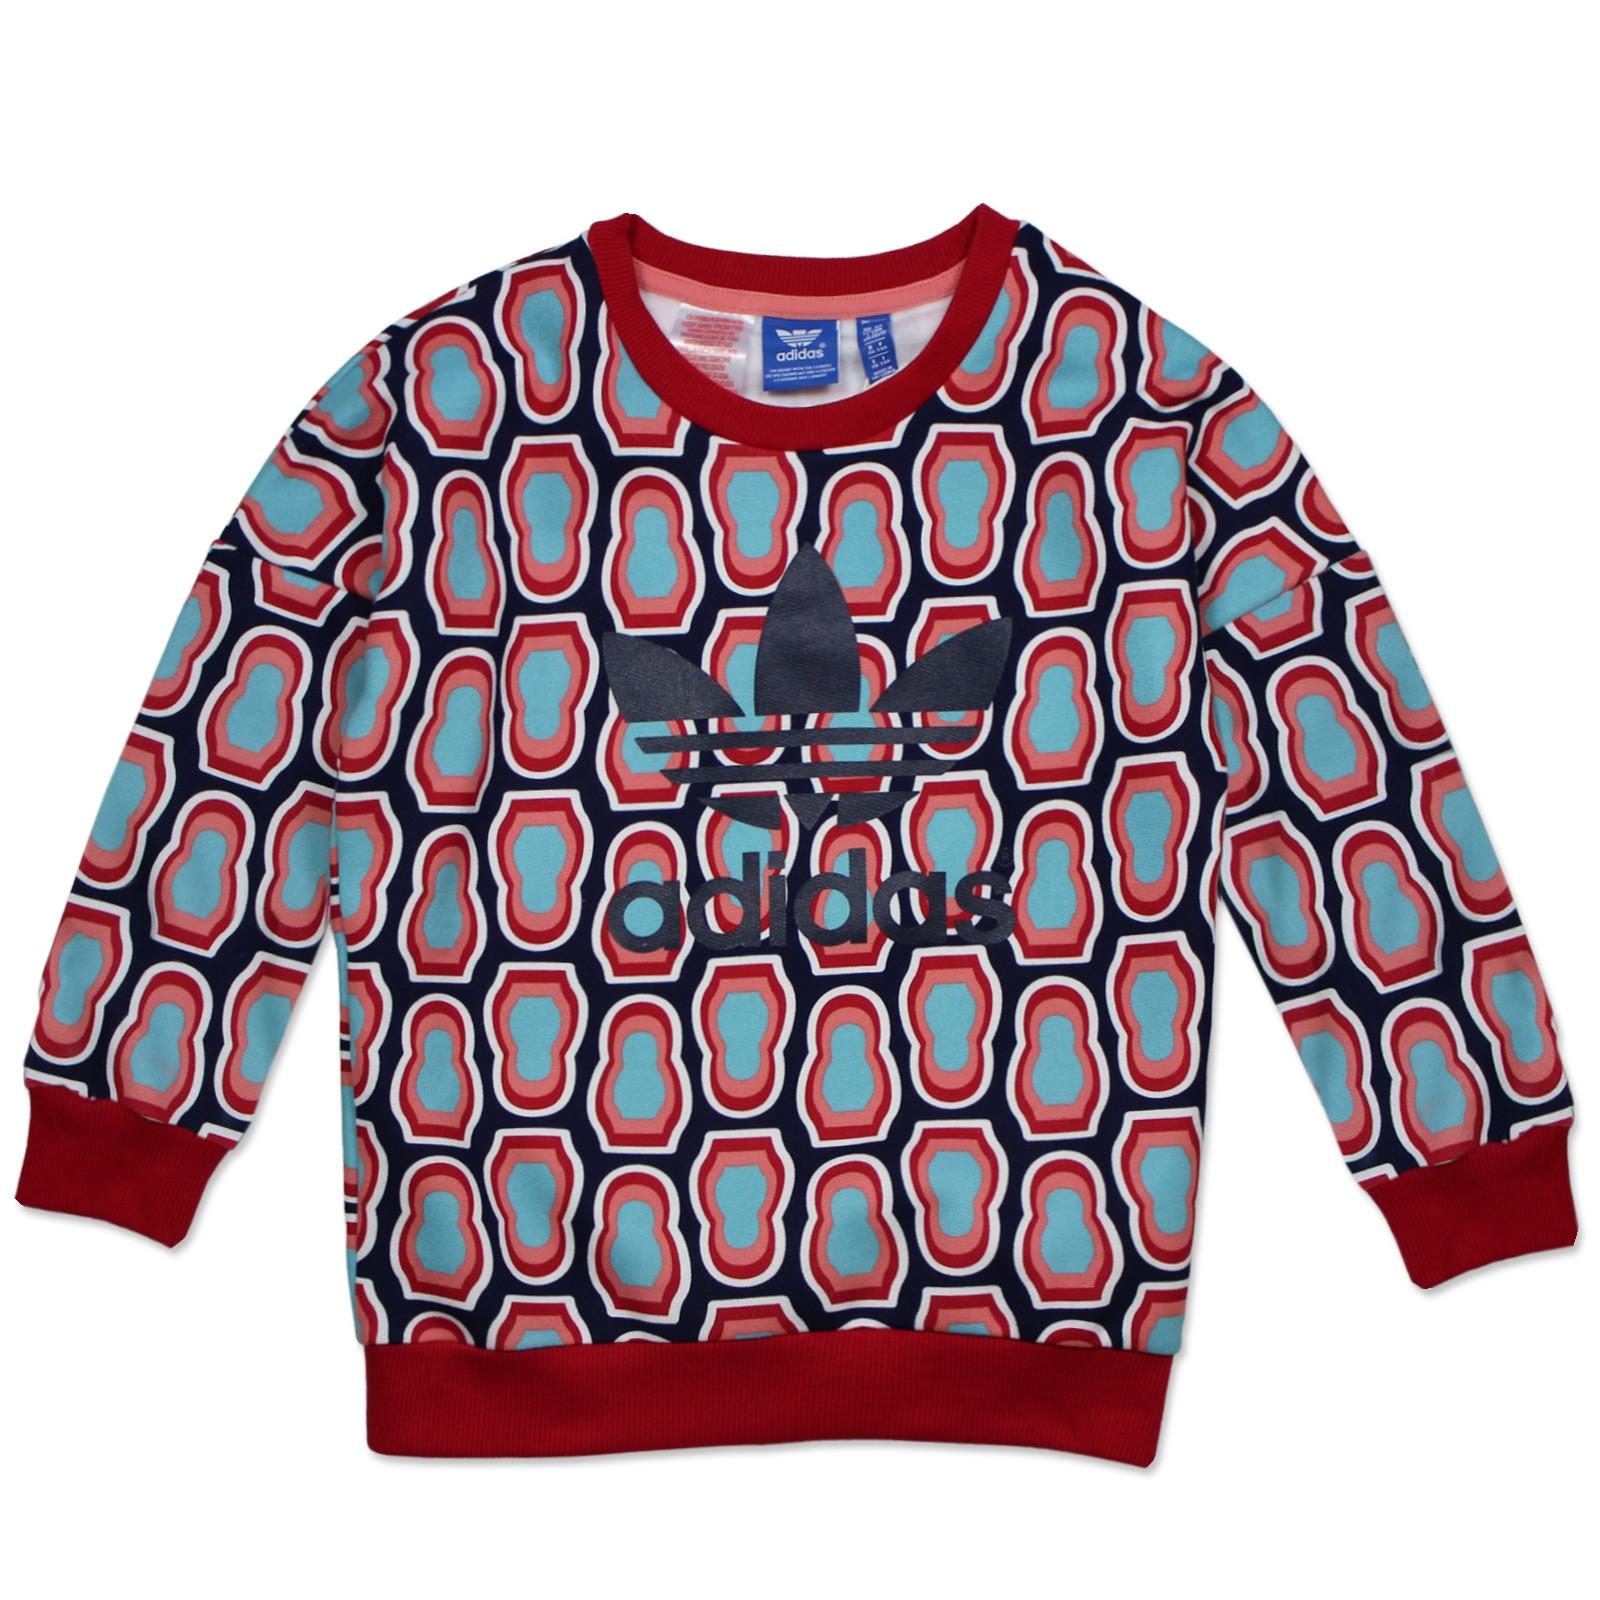 adidas originals all over print trefoil kinder crew sweatshirt m dchen bunt kinder sweatshirts. Black Bedroom Furniture Sets. Home Design Ideas